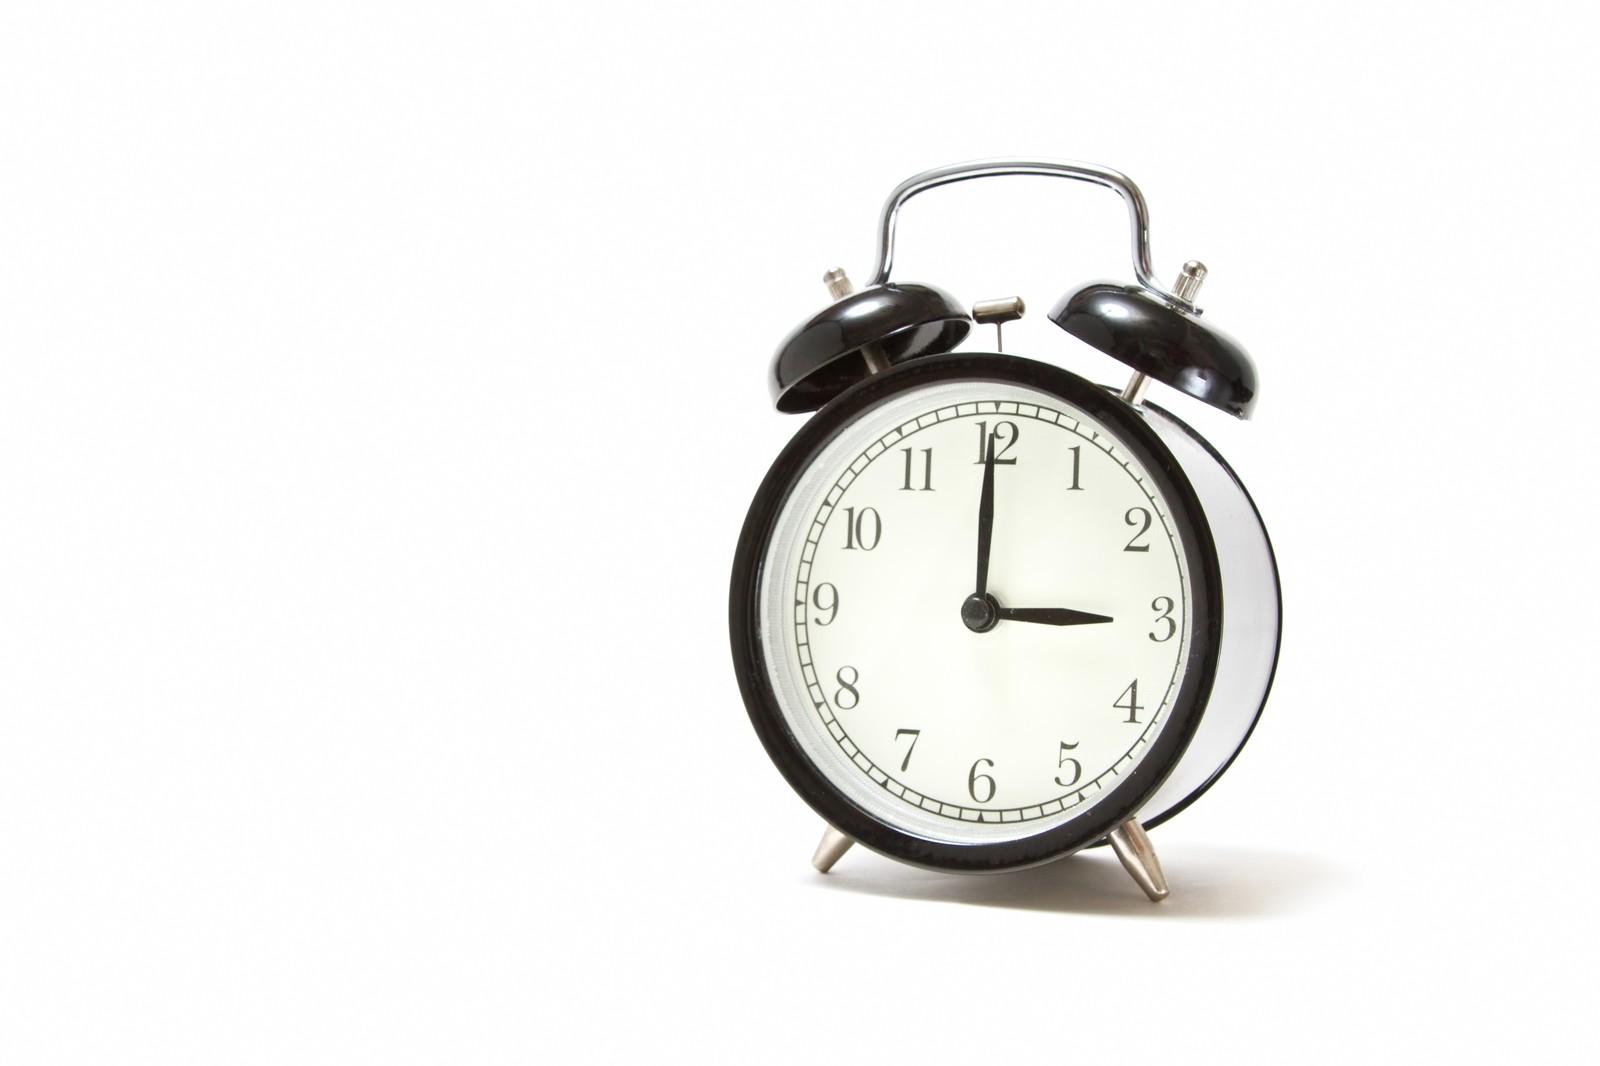 TOEICスコアを上げる理想の時間配分とは?